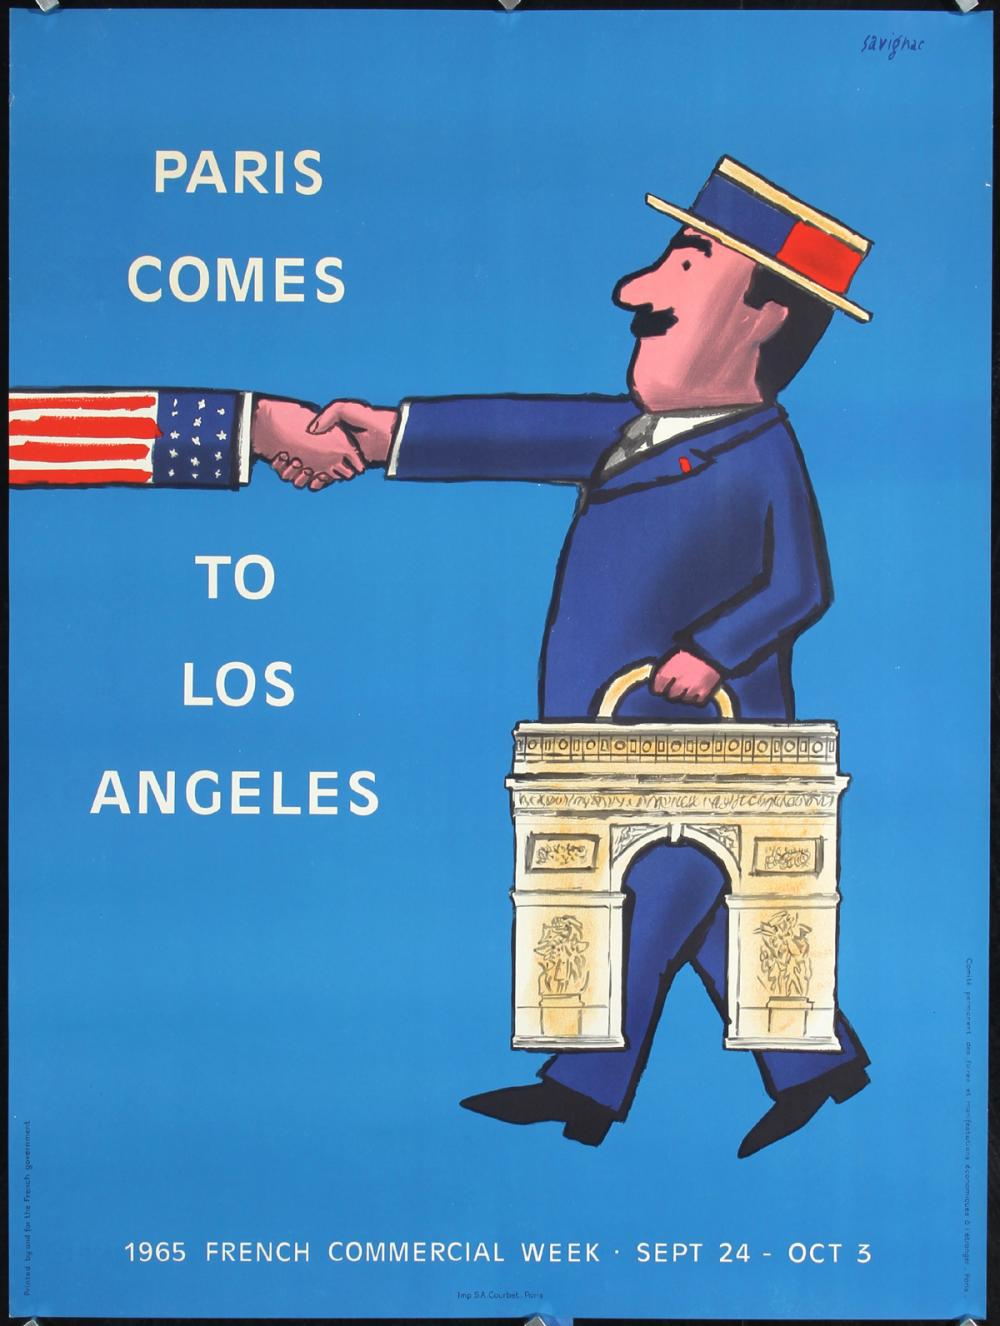 Original 1950s Paris Travel Poster SAVIGNAC Art Affiche